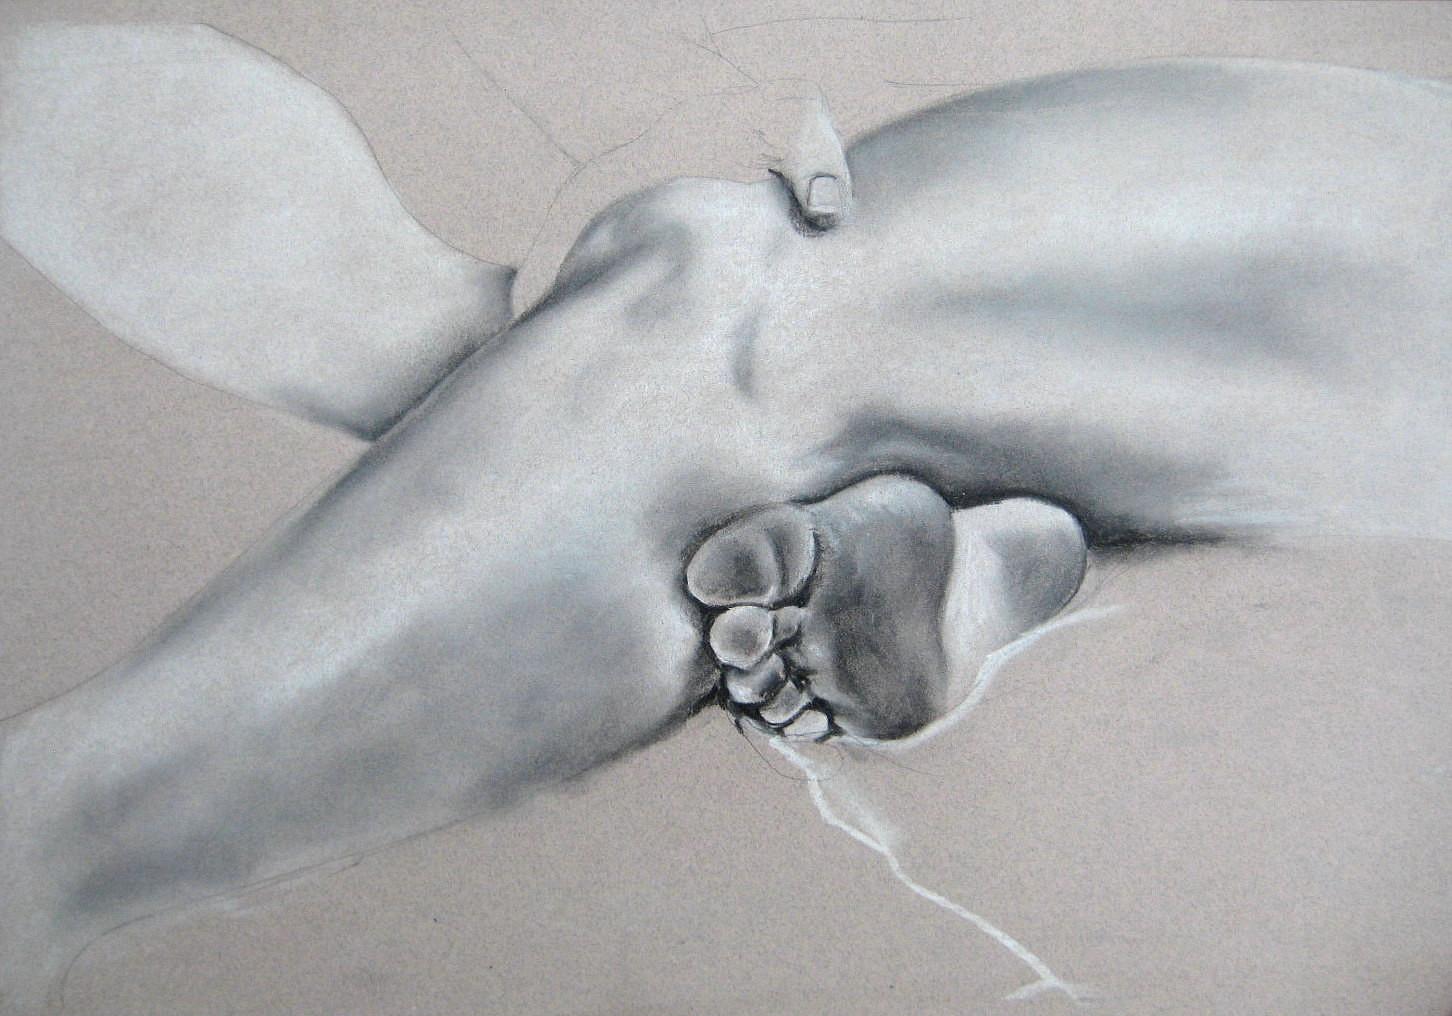 http://4.bp.blogspot.com/--gYYYZTeVxI/TuPp84PTrUI/AAAAAAAABAQ/KuvDYKLX7OU/s1600/Leg+and+Foot.jpg